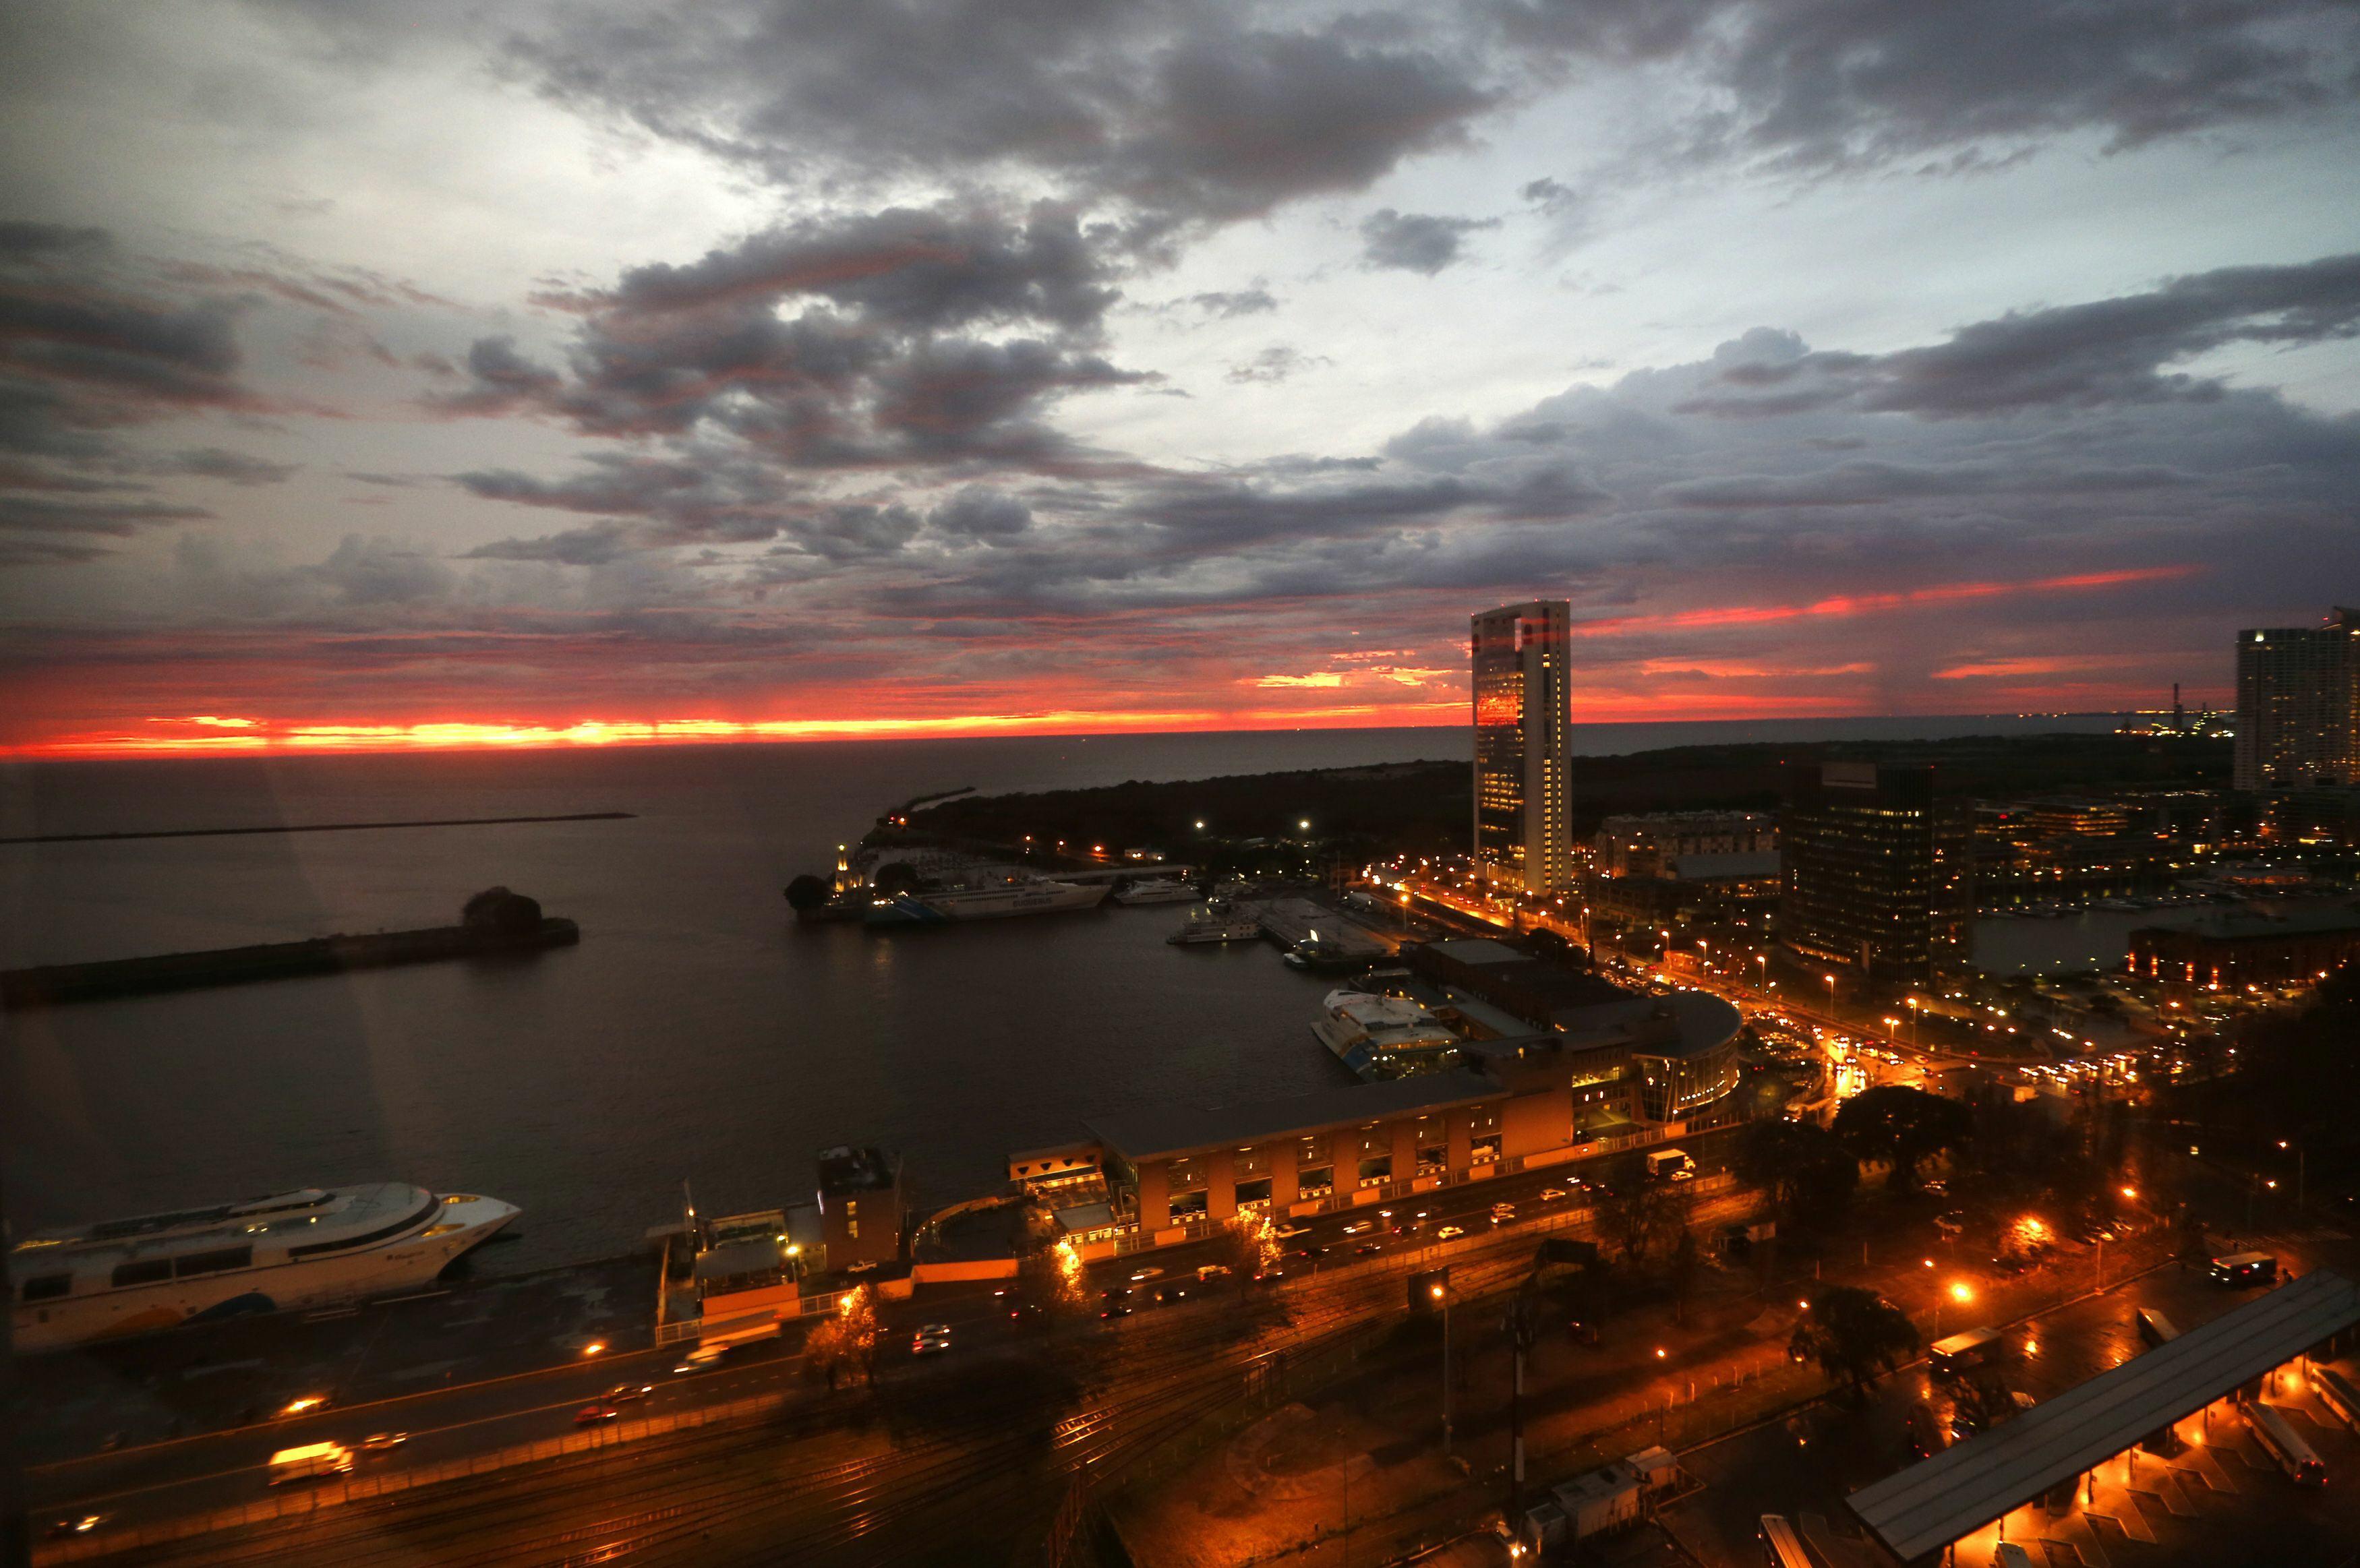 Argentina's eternal debt problem